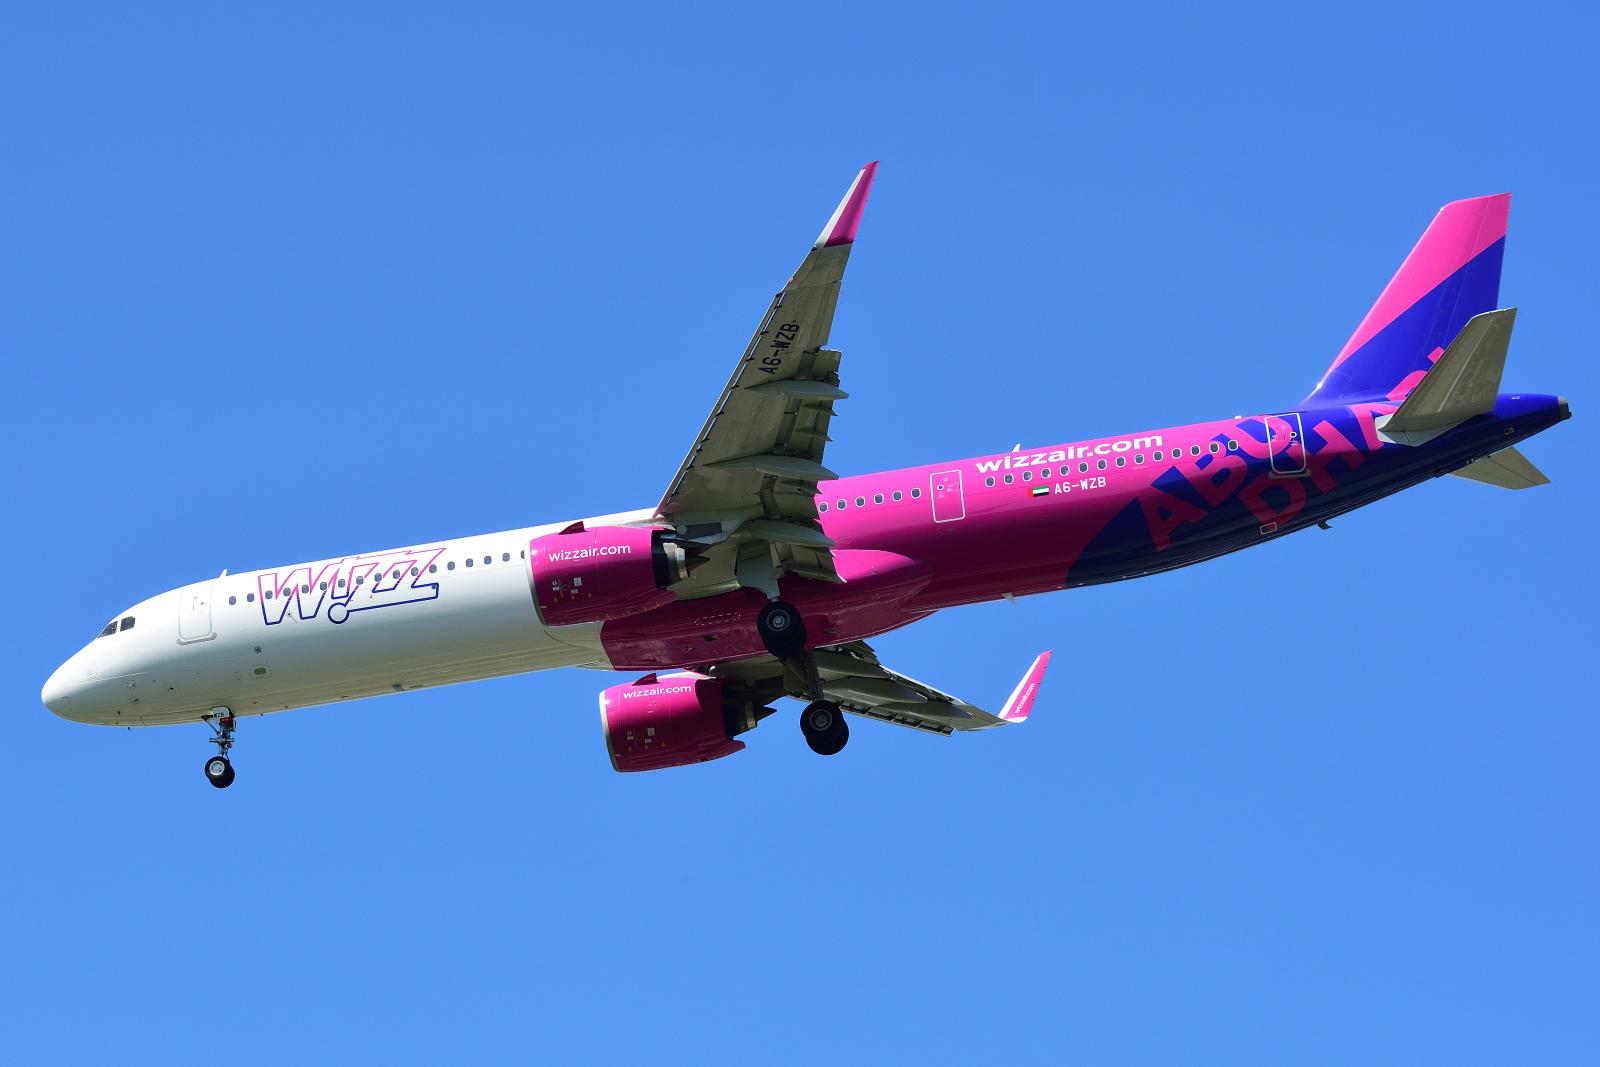 Airbus A321, A6-WZB